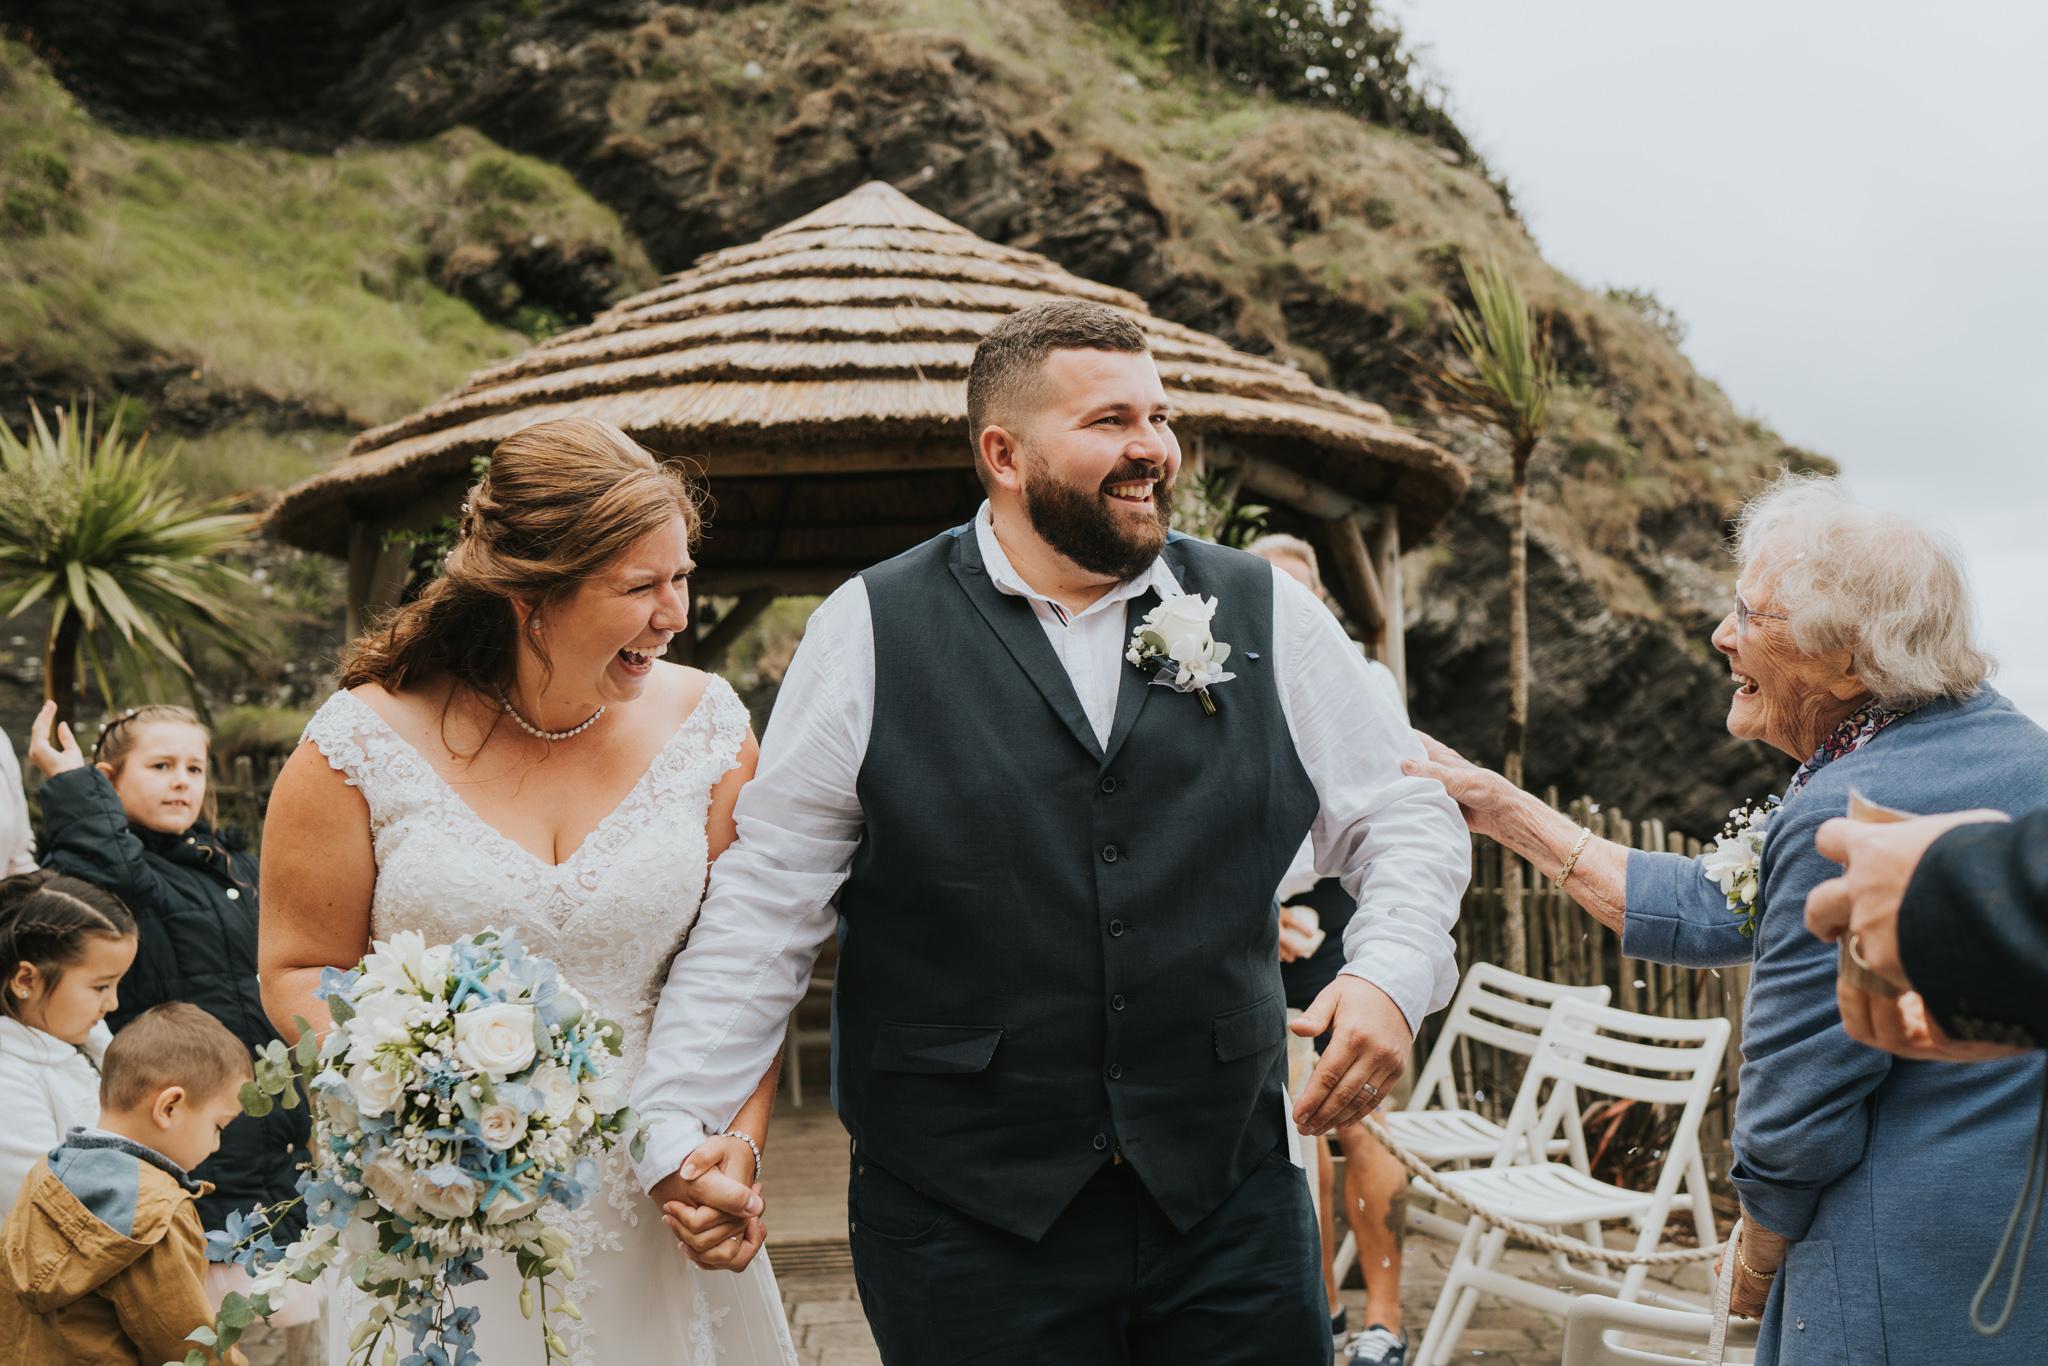 john-amy-relaxed-beach-wedding-tunnels-beaches-ilfracombe-north-devon-grace-elizabeth-colchester-essex-alternative-relaxed-wedding-photography-devon-suffolk-norfolk-essex (67 of 159).jpg